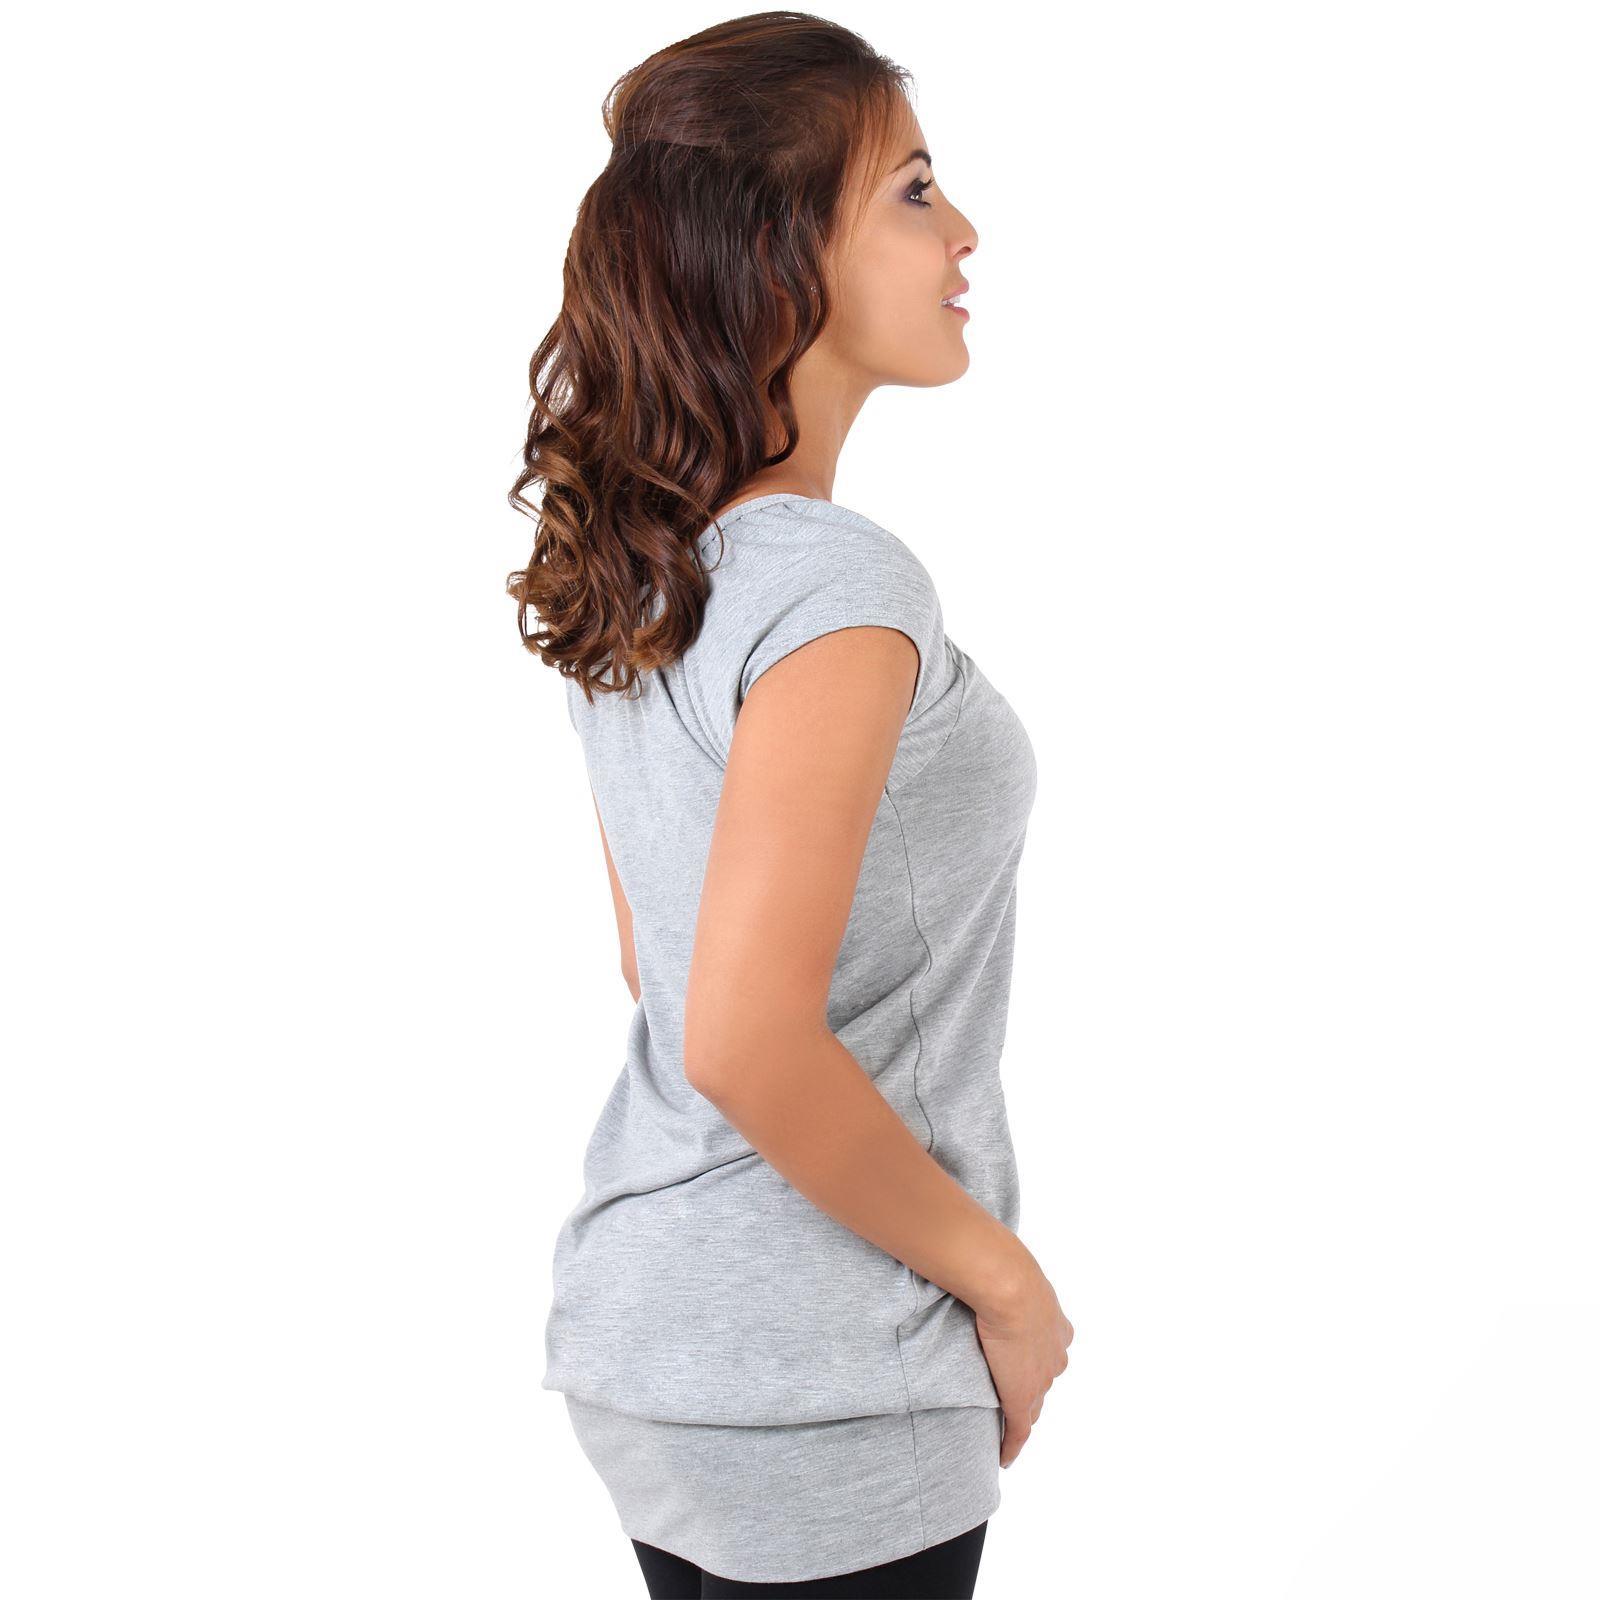 Womens-Ladies-Plain-T-Shirt-Short-Sleeve-Long-Loose-V-Neck-Blouse-Tunic-Top thumbnail 22